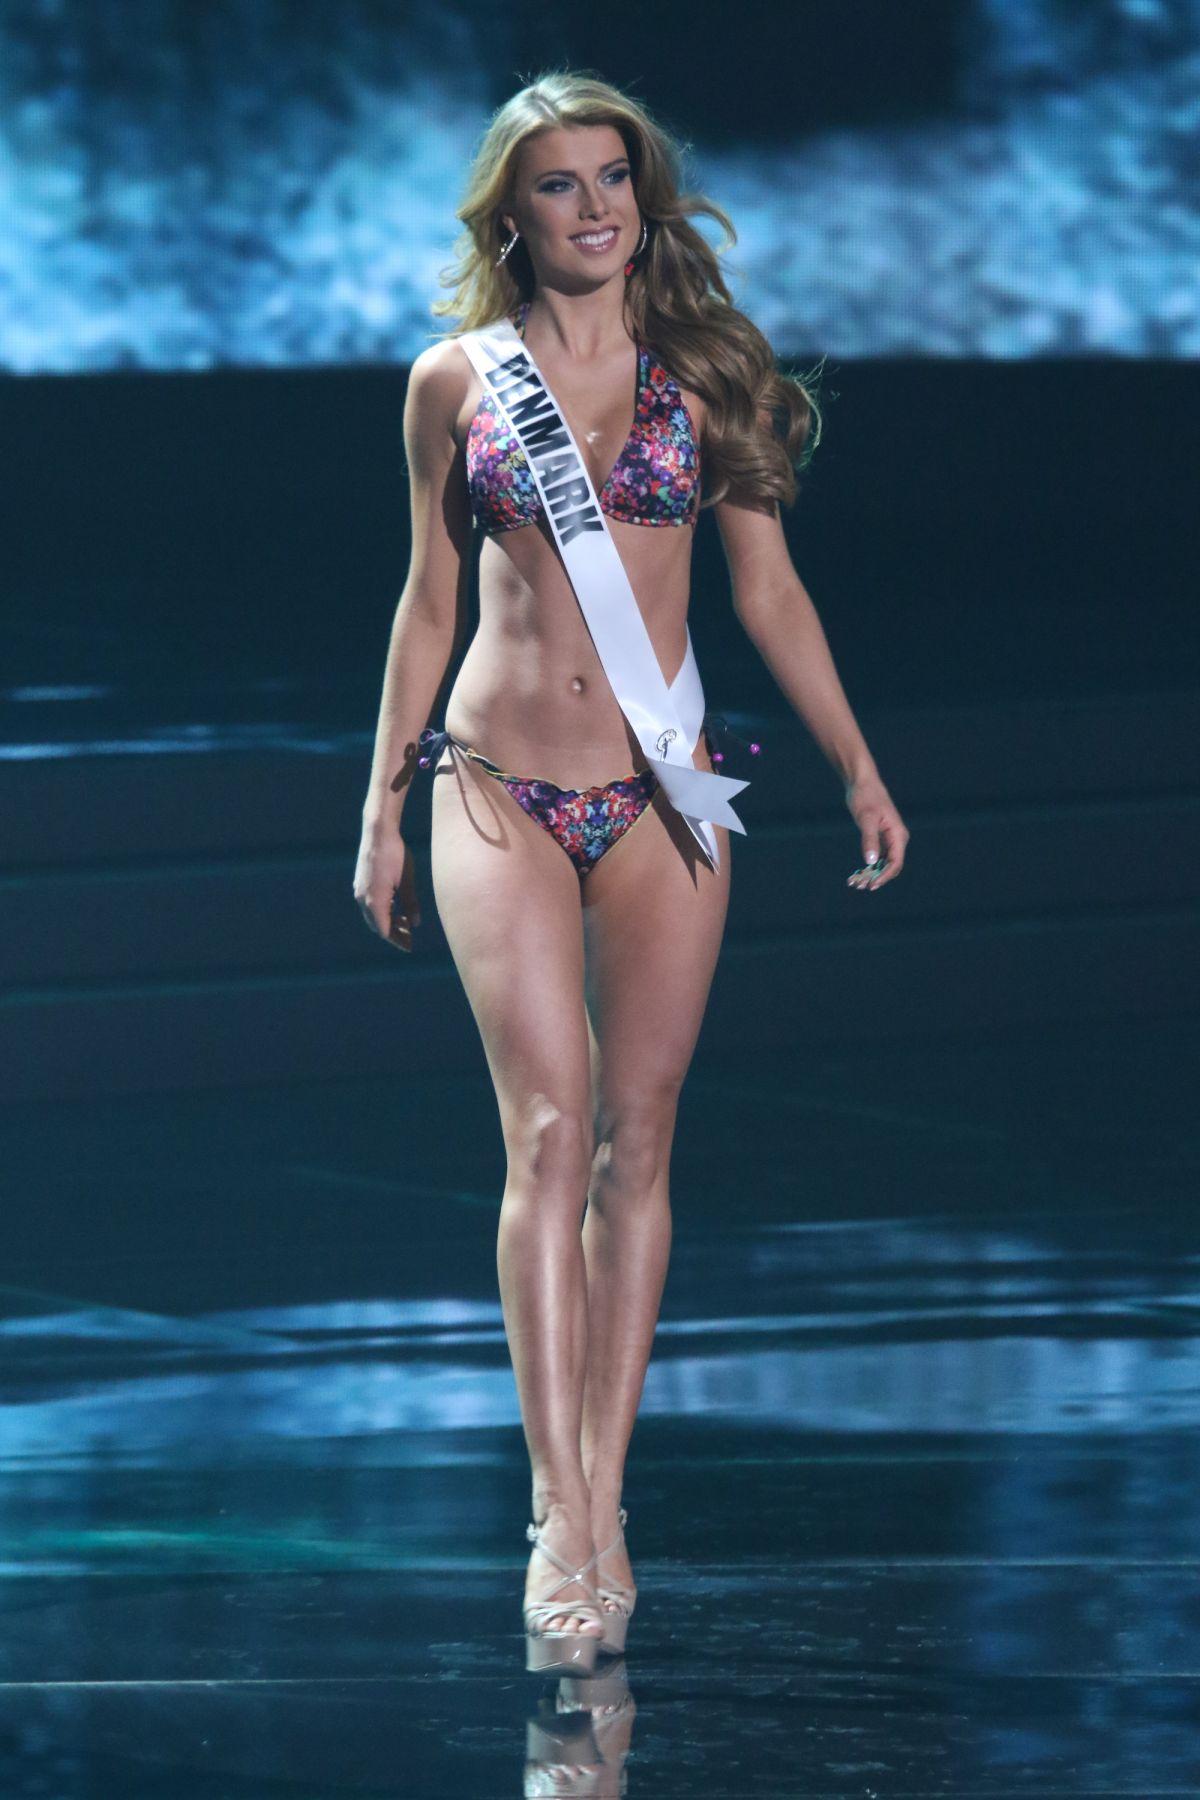 CECILIA WELLEMBERG - Miss Universe 2015 Preliminary Round 12/16/2015